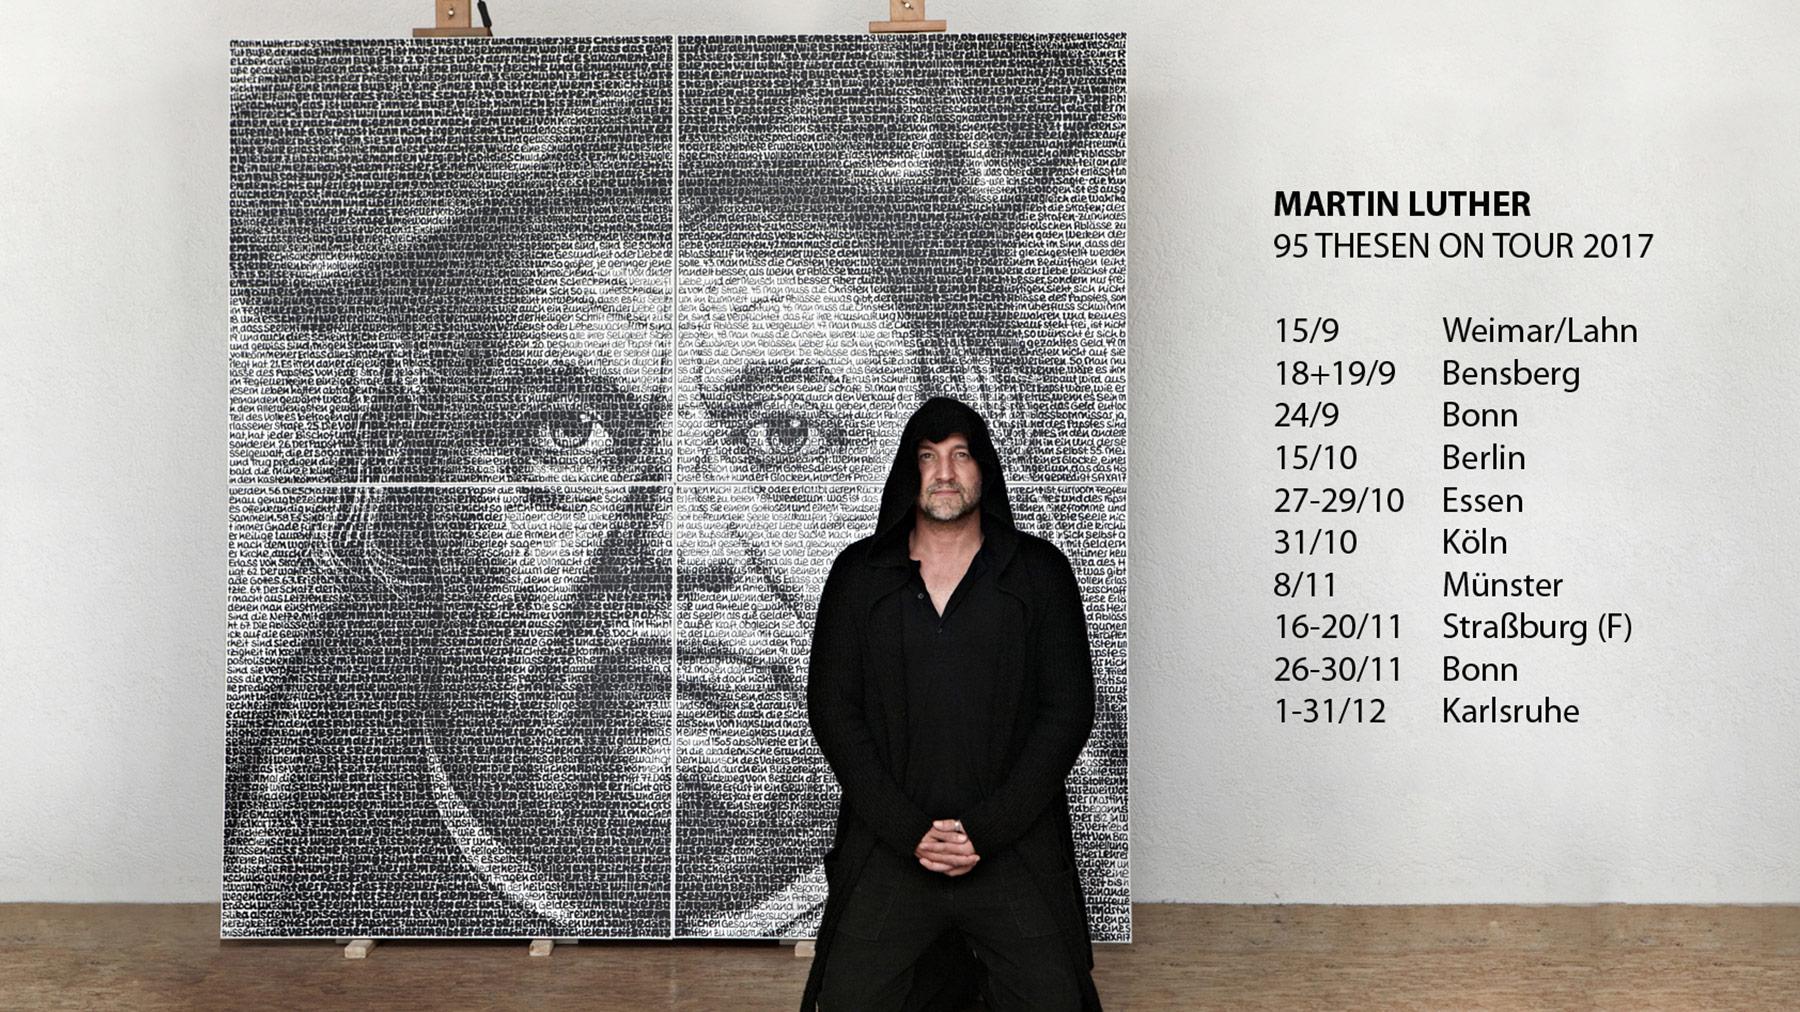 martin luther on tour saxa. Black Bedroom Furniture Sets. Home Design Ideas